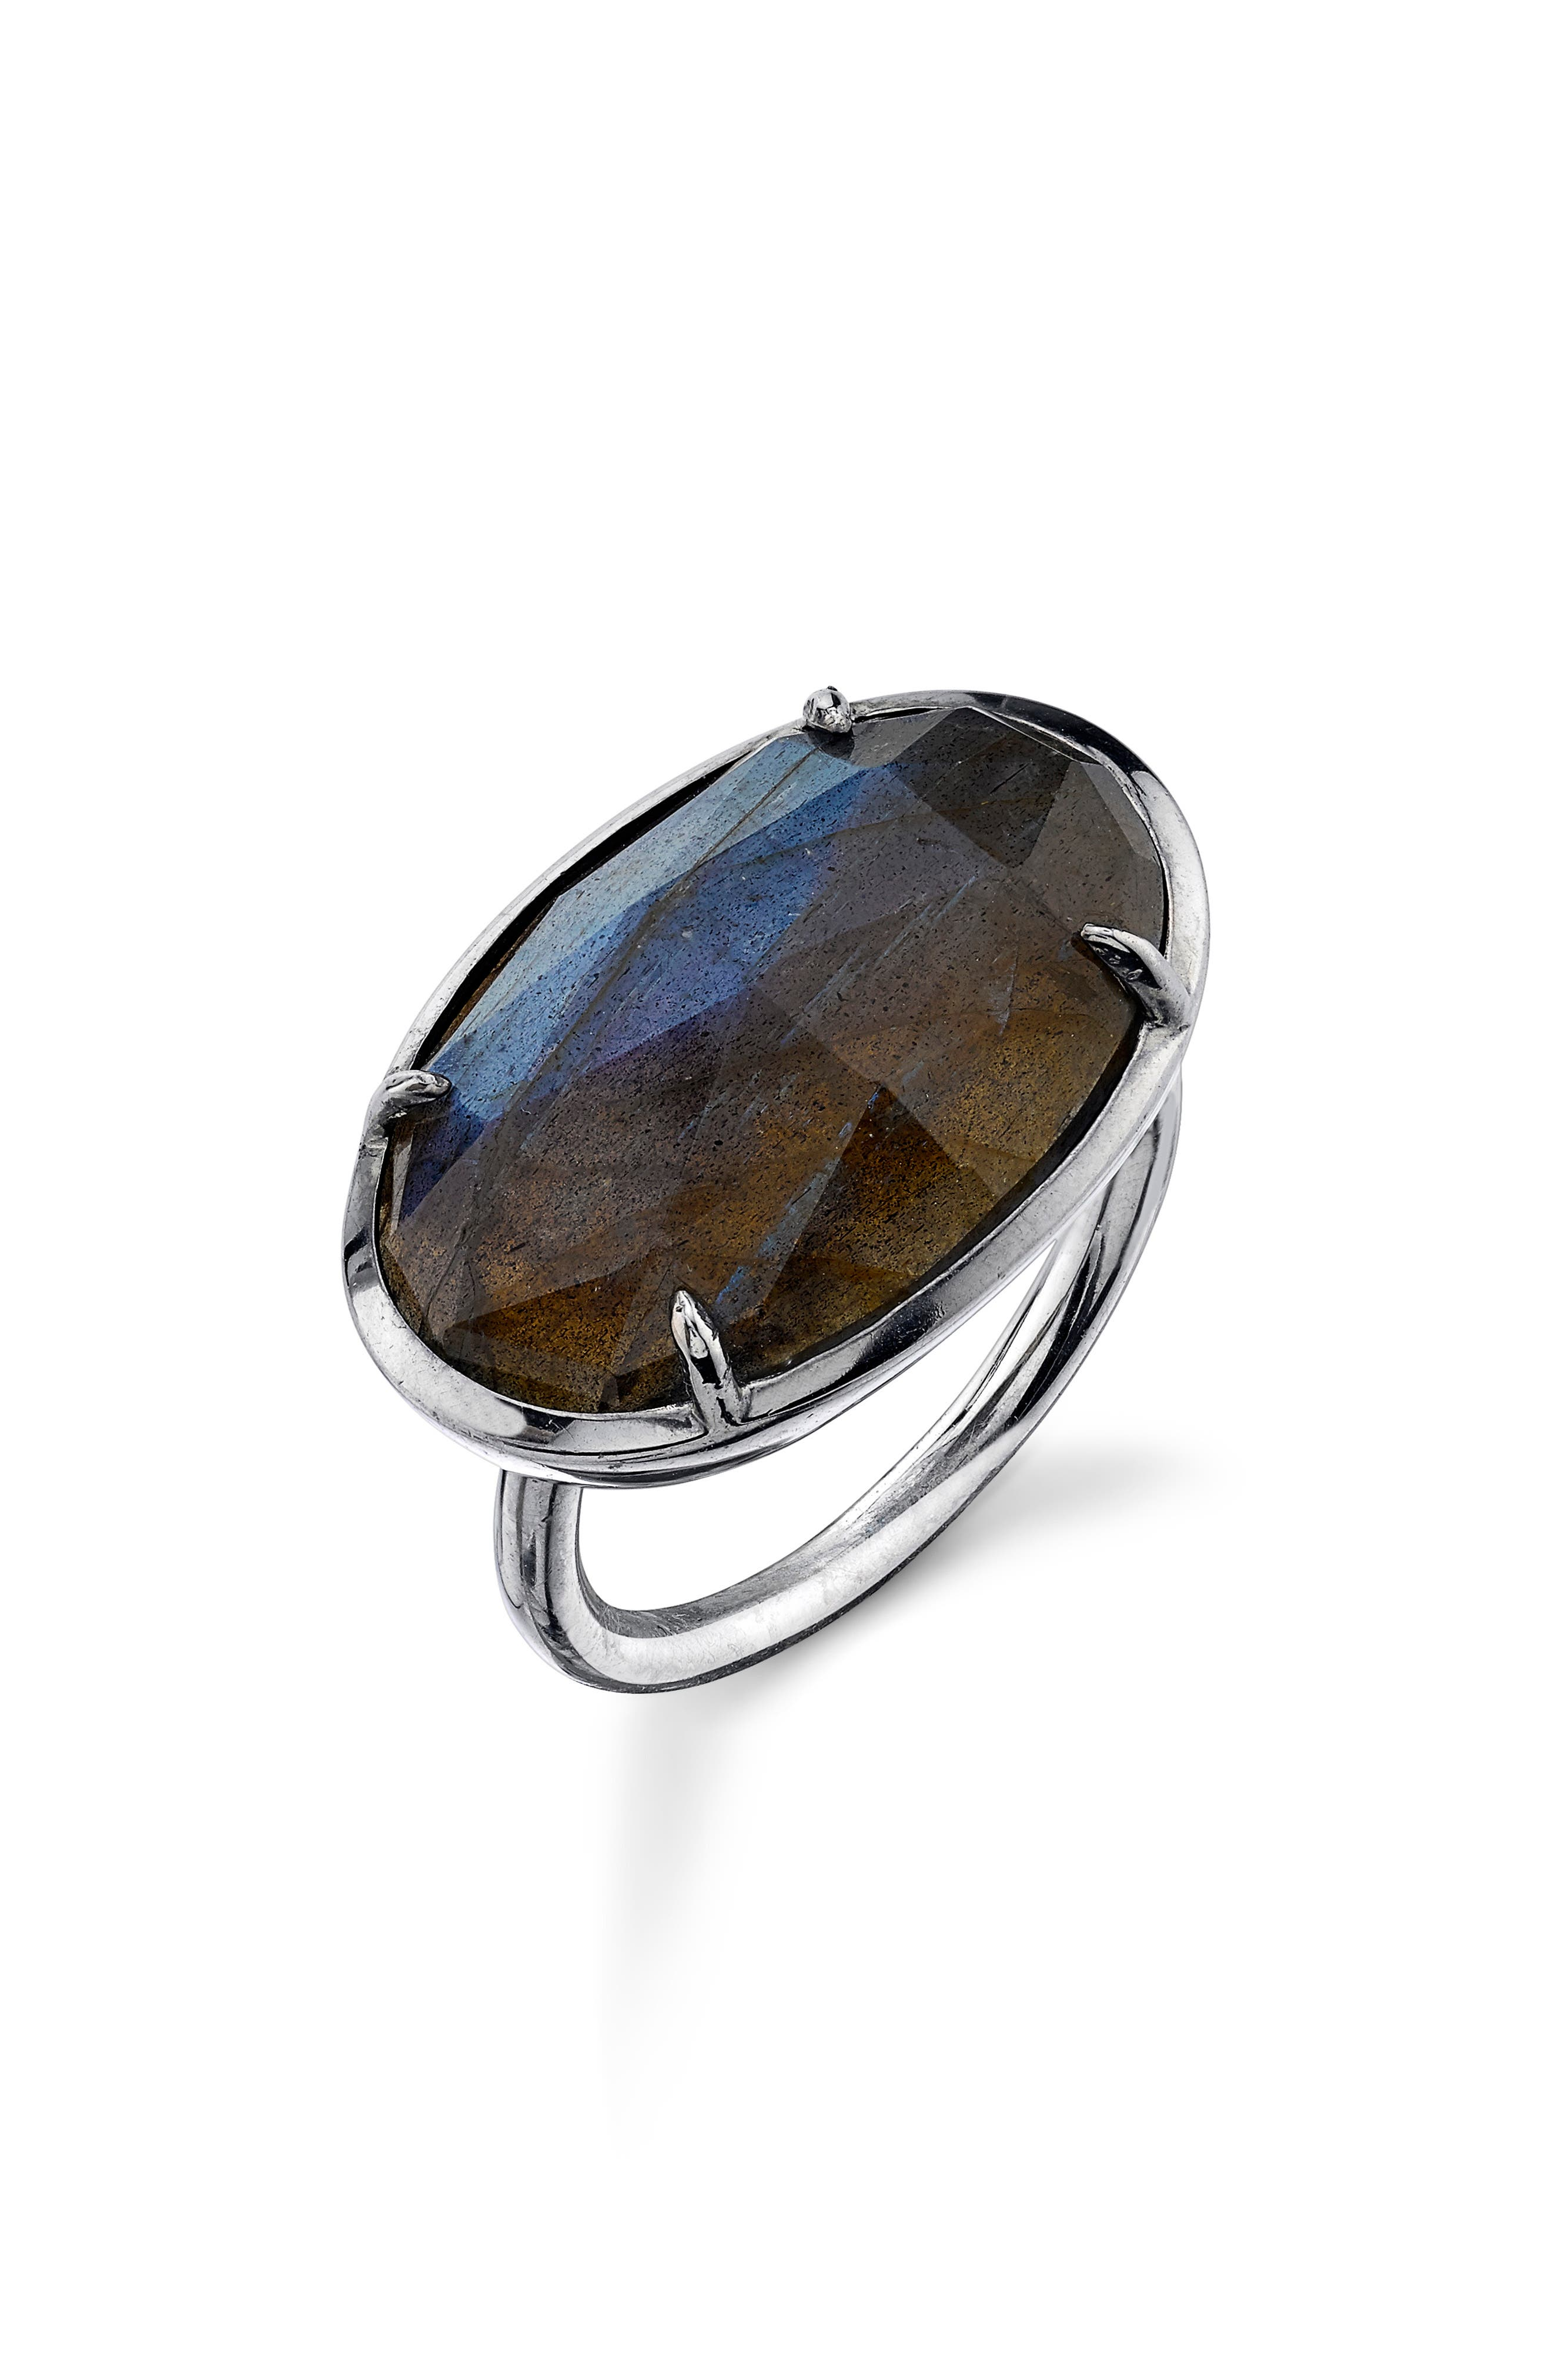 East/West Labradorite Ring